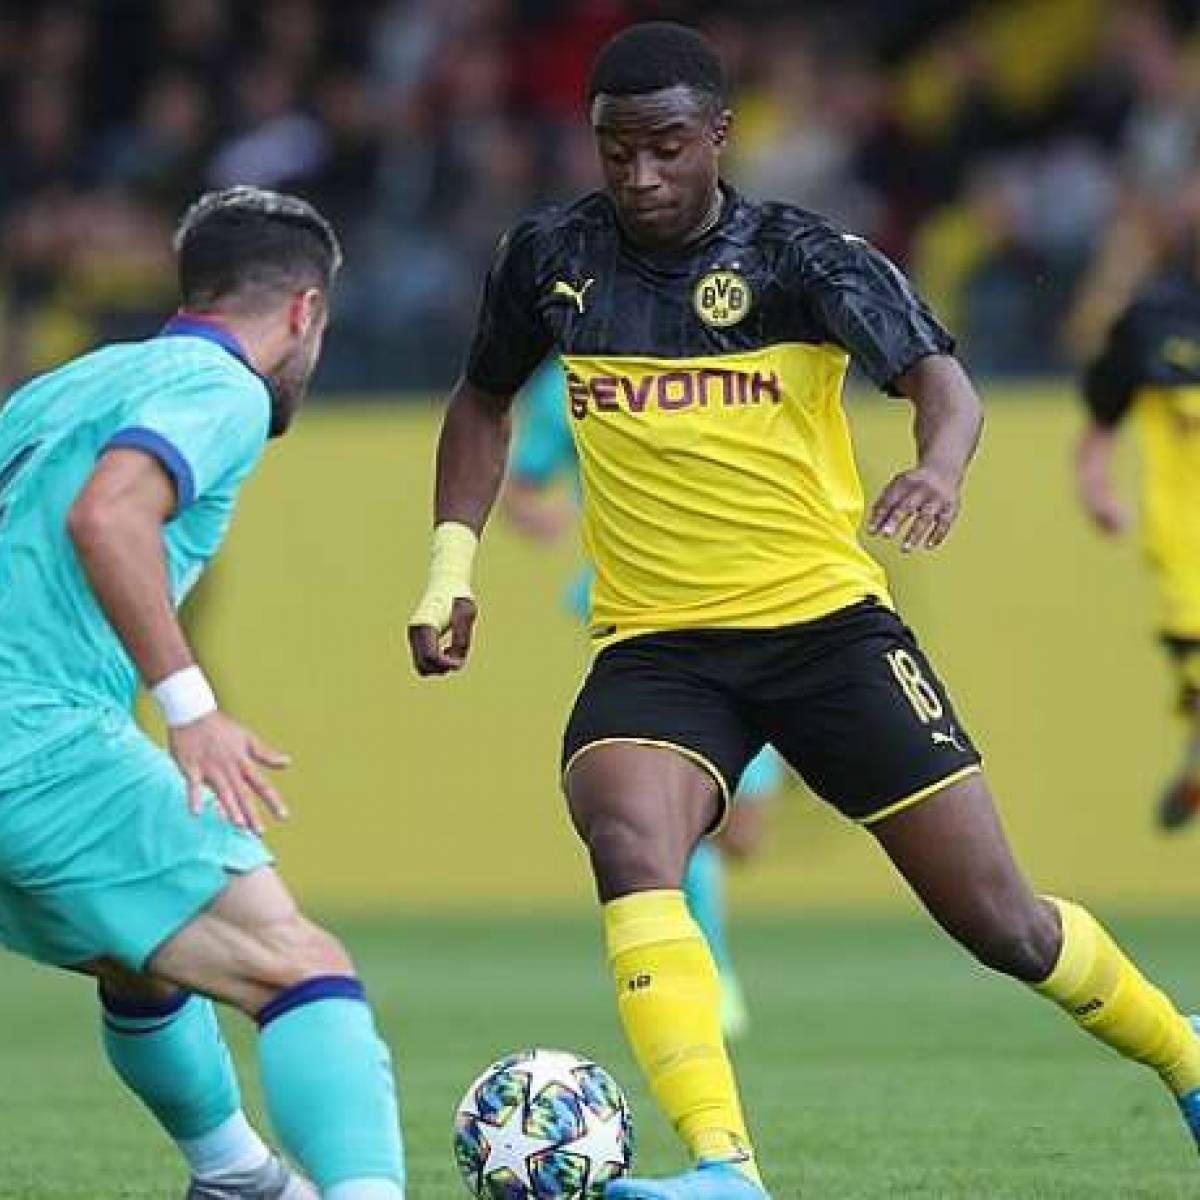 Borussia Dortmund : on n'arrête plus le grand espoir Youssoufa Moukoko